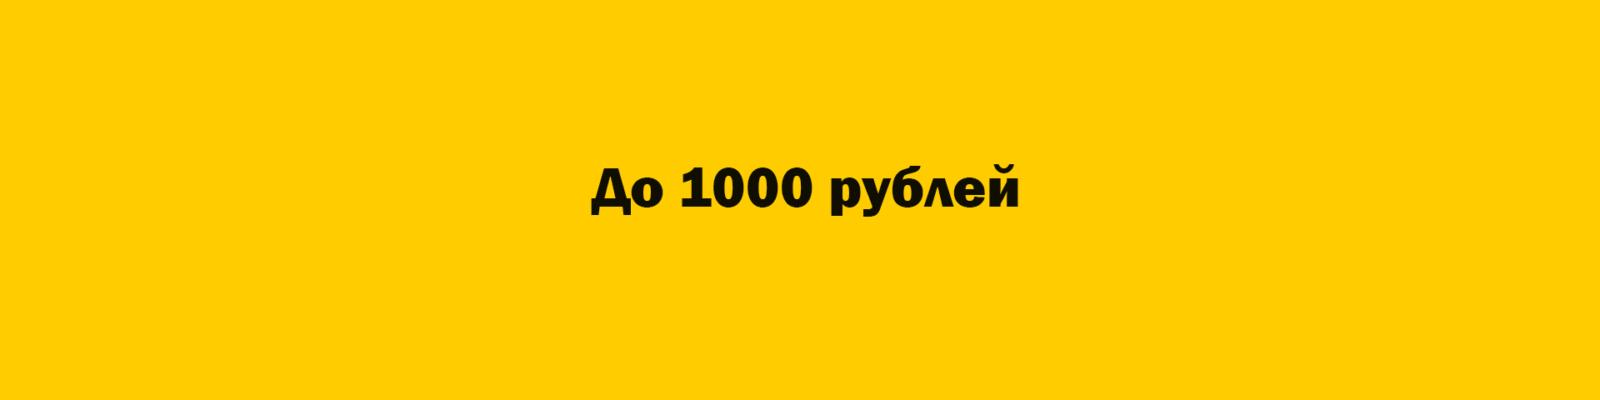 bukety-do-1000-rublej